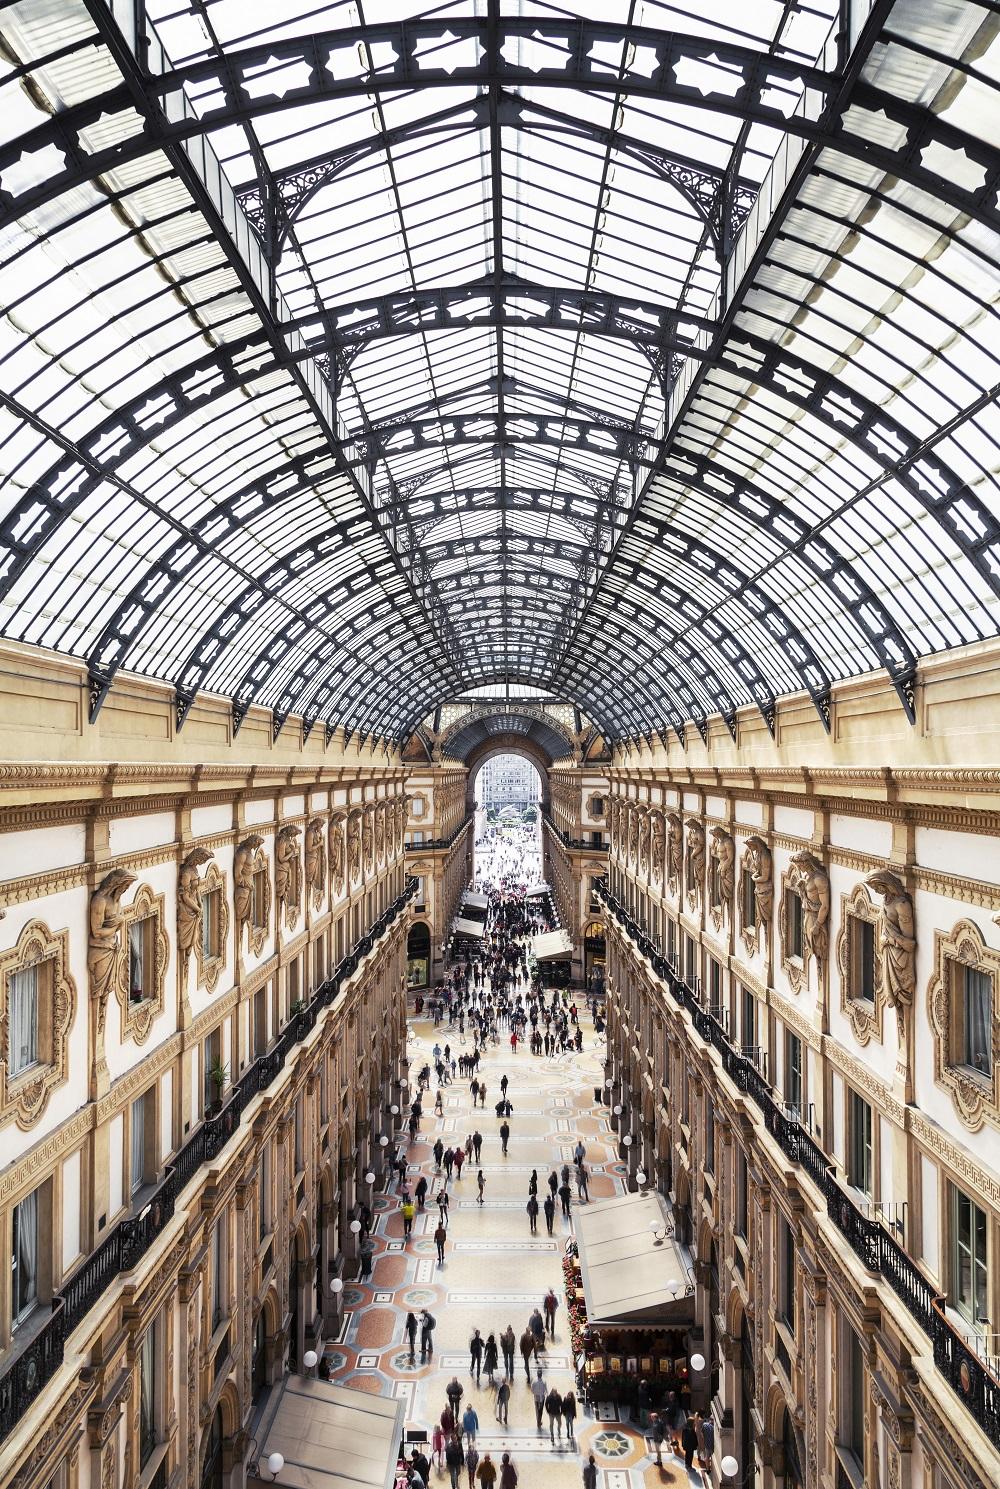 GALLERIA VIK MILANO IN MILAN, ITALY